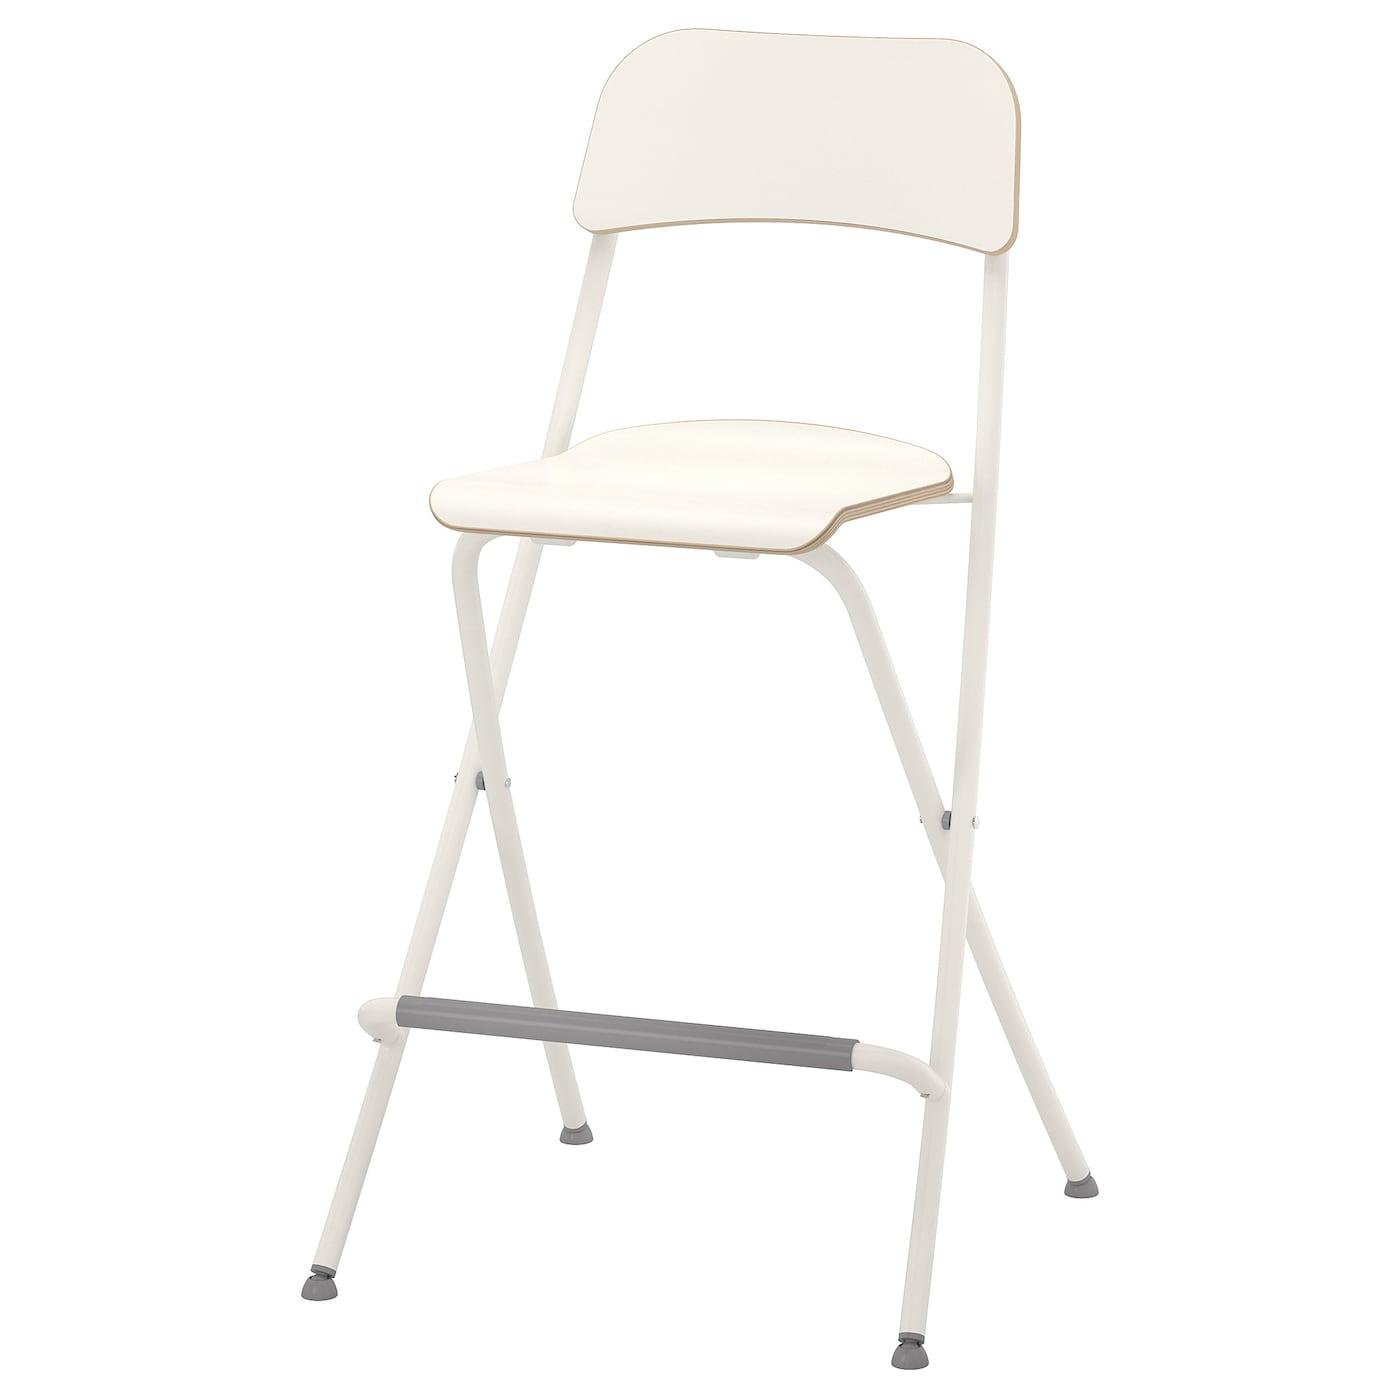 FRANKLIN Bar stool with backrest, foldable - white/white 3 cm